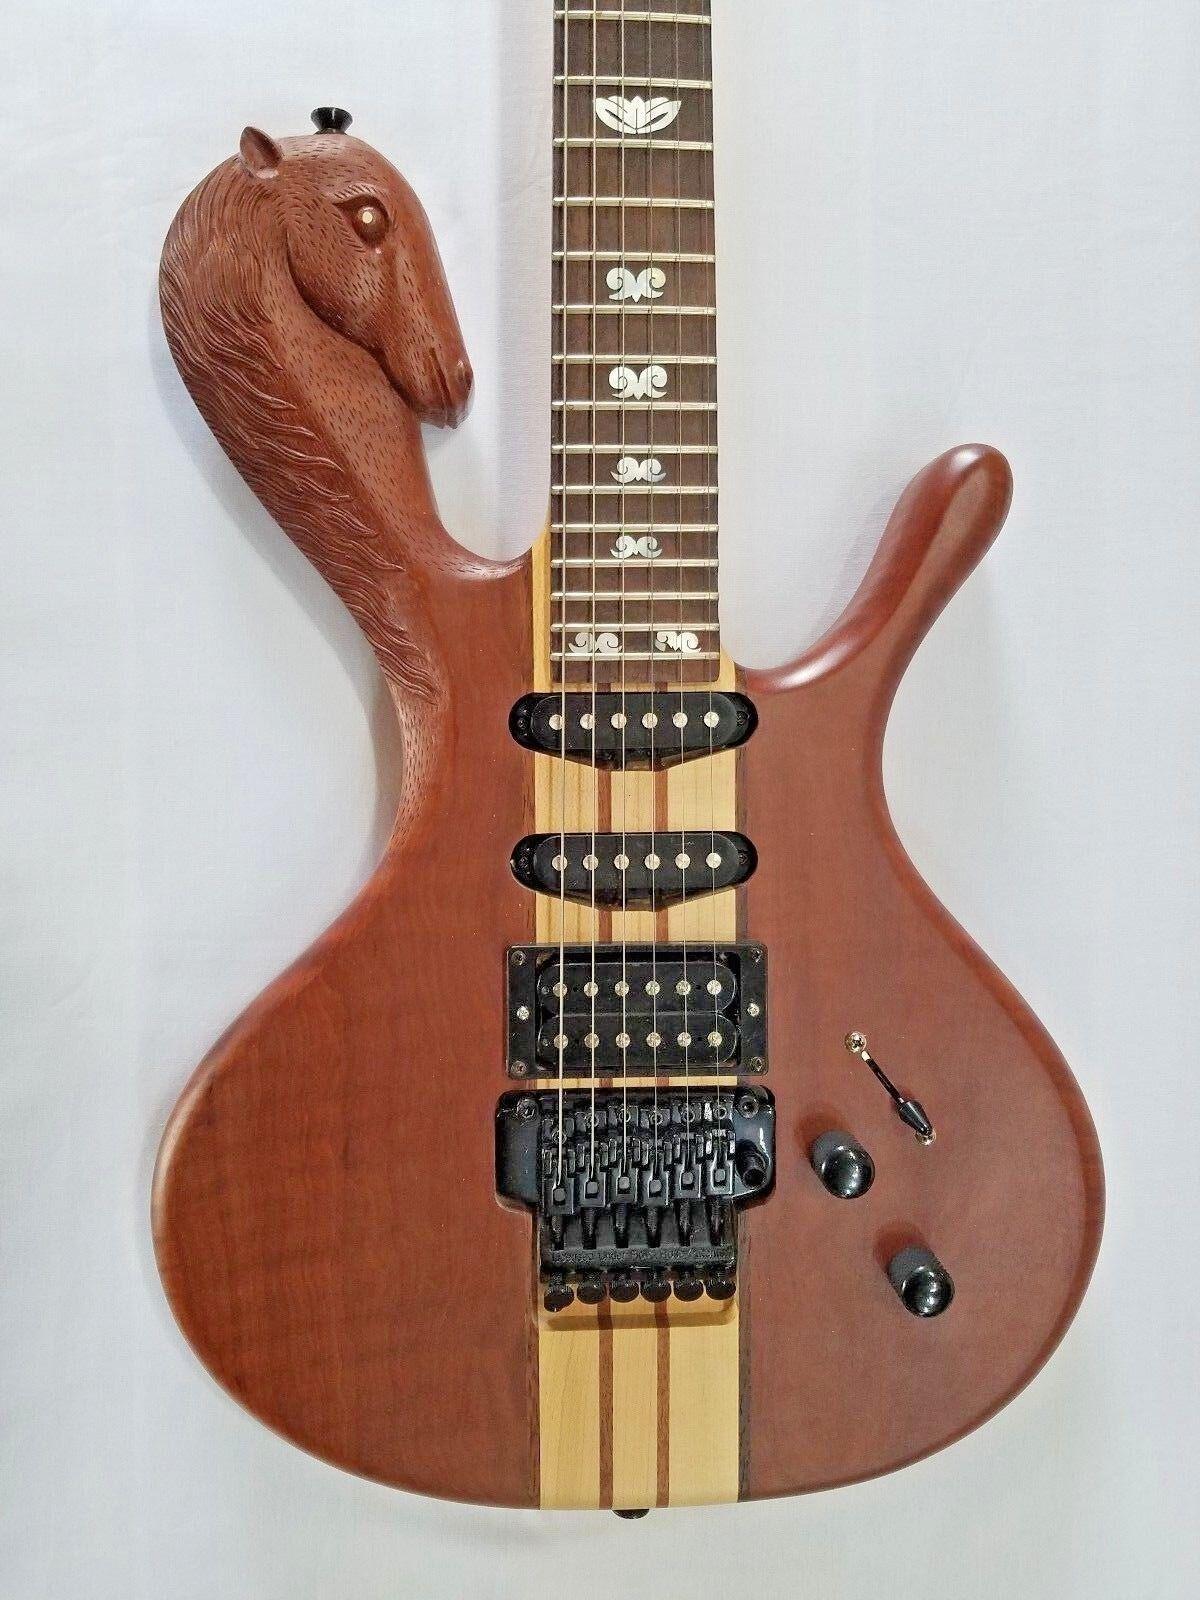 NEU Guitar, Carved Horse Hals thru, Perlmutt, Abaloninway